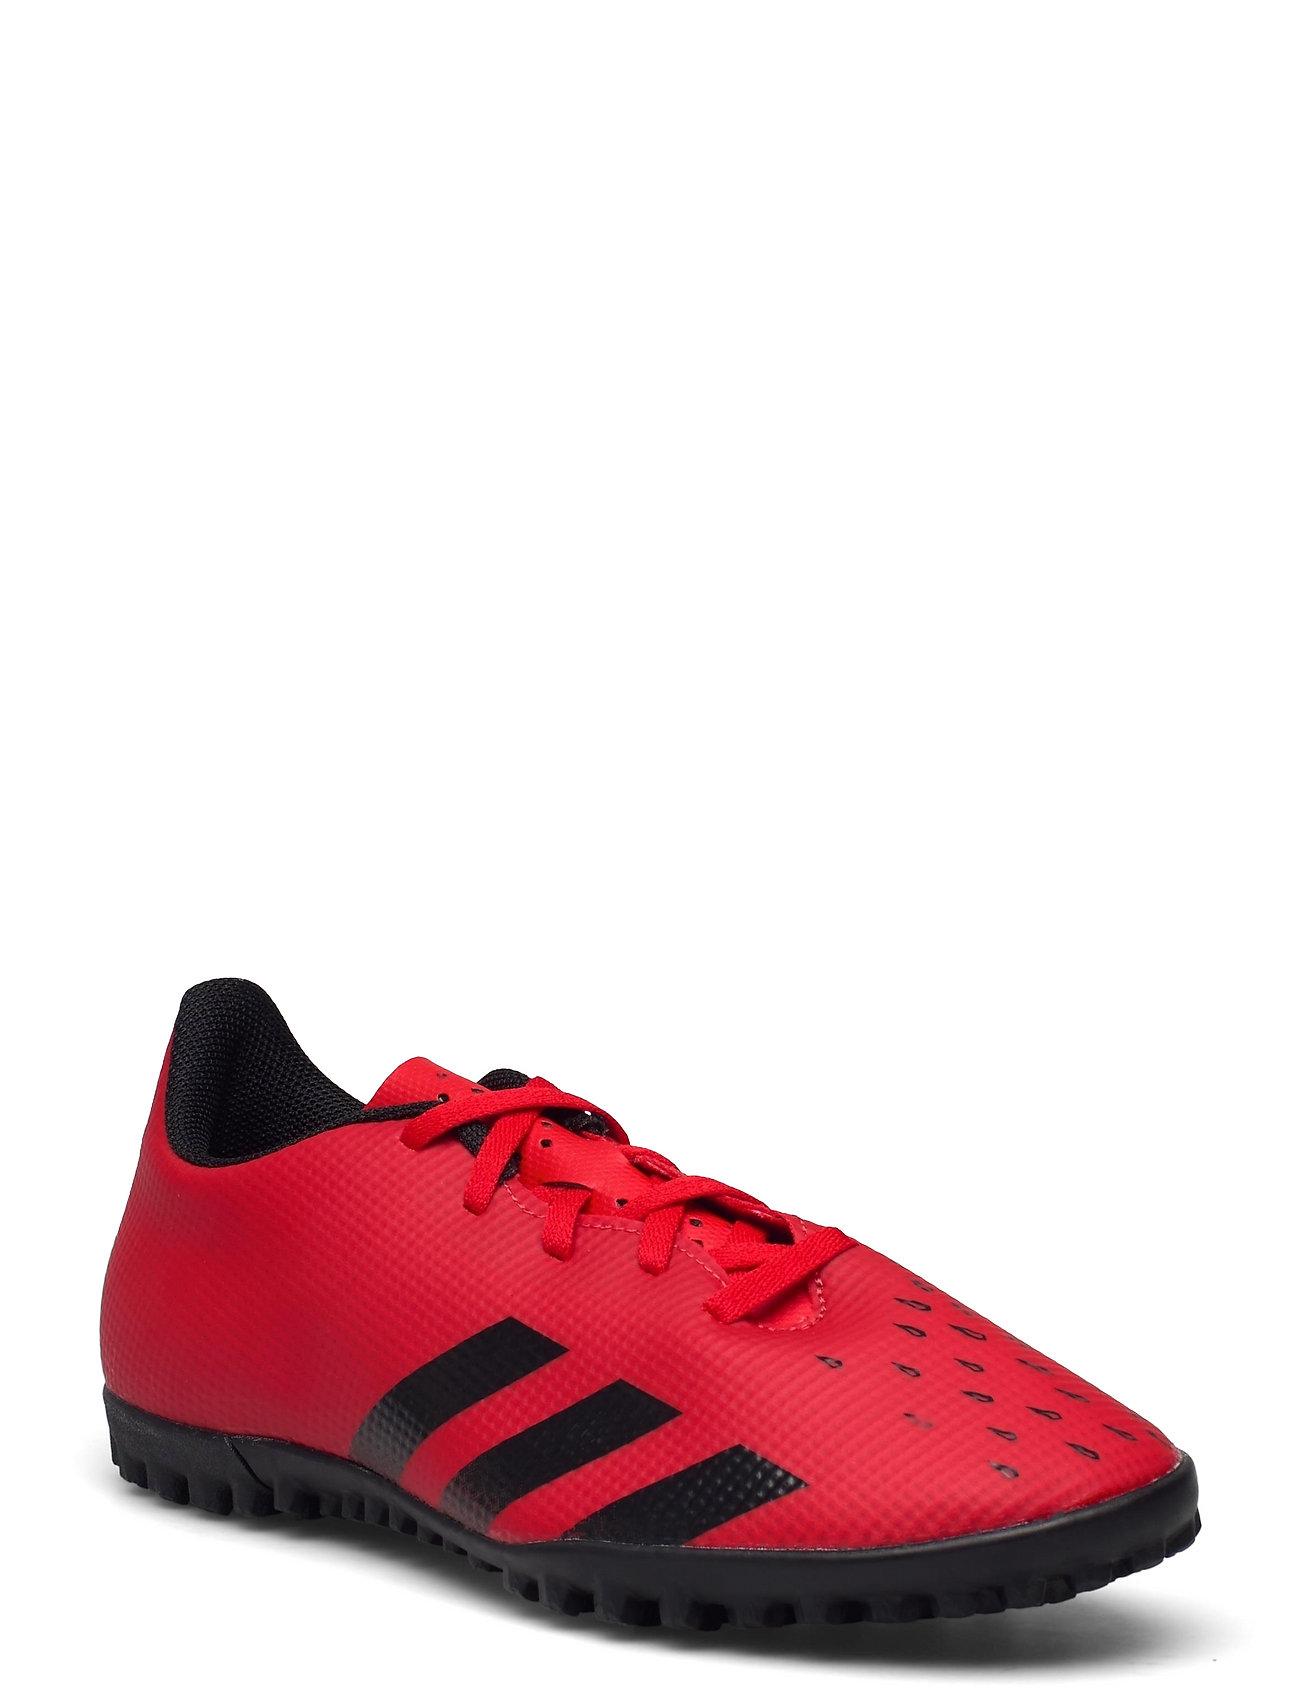 Predator Freak.4 Turf Boots Q3q4 21 Shoes Sport Shoes Football Boots Rød Adidas Performance